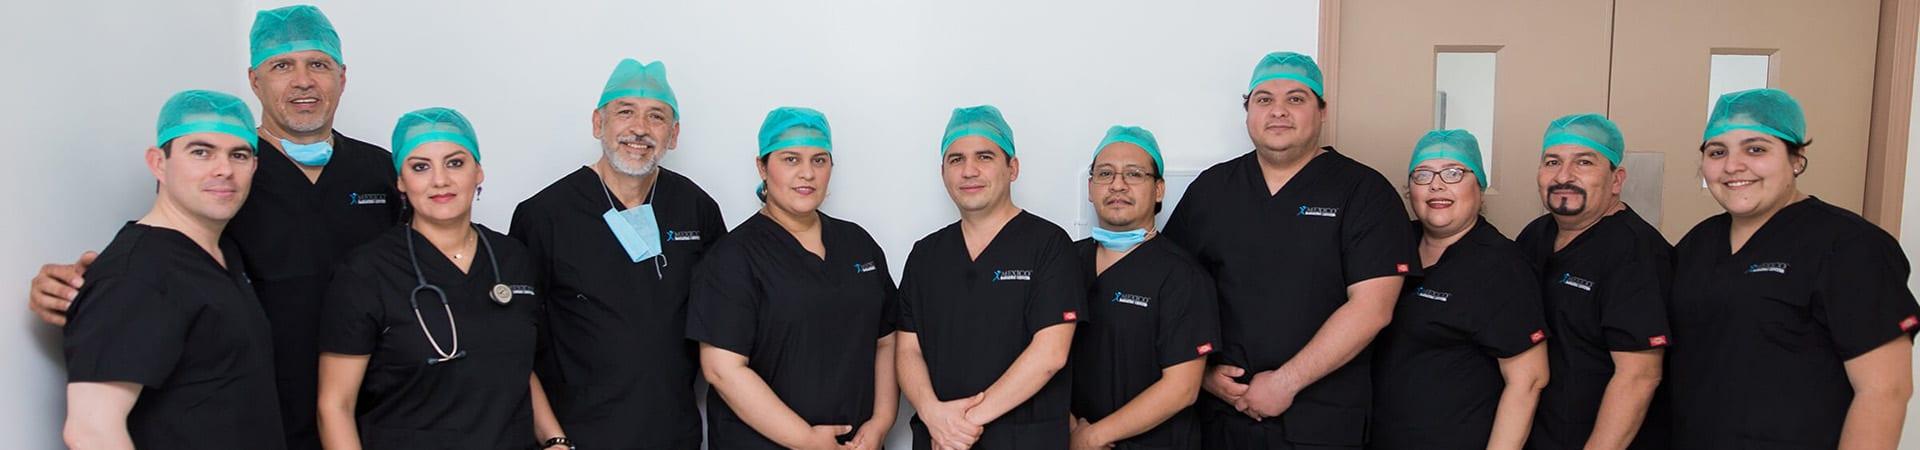 Mexico Bariatric Center Surgery Staff and Advisory Board